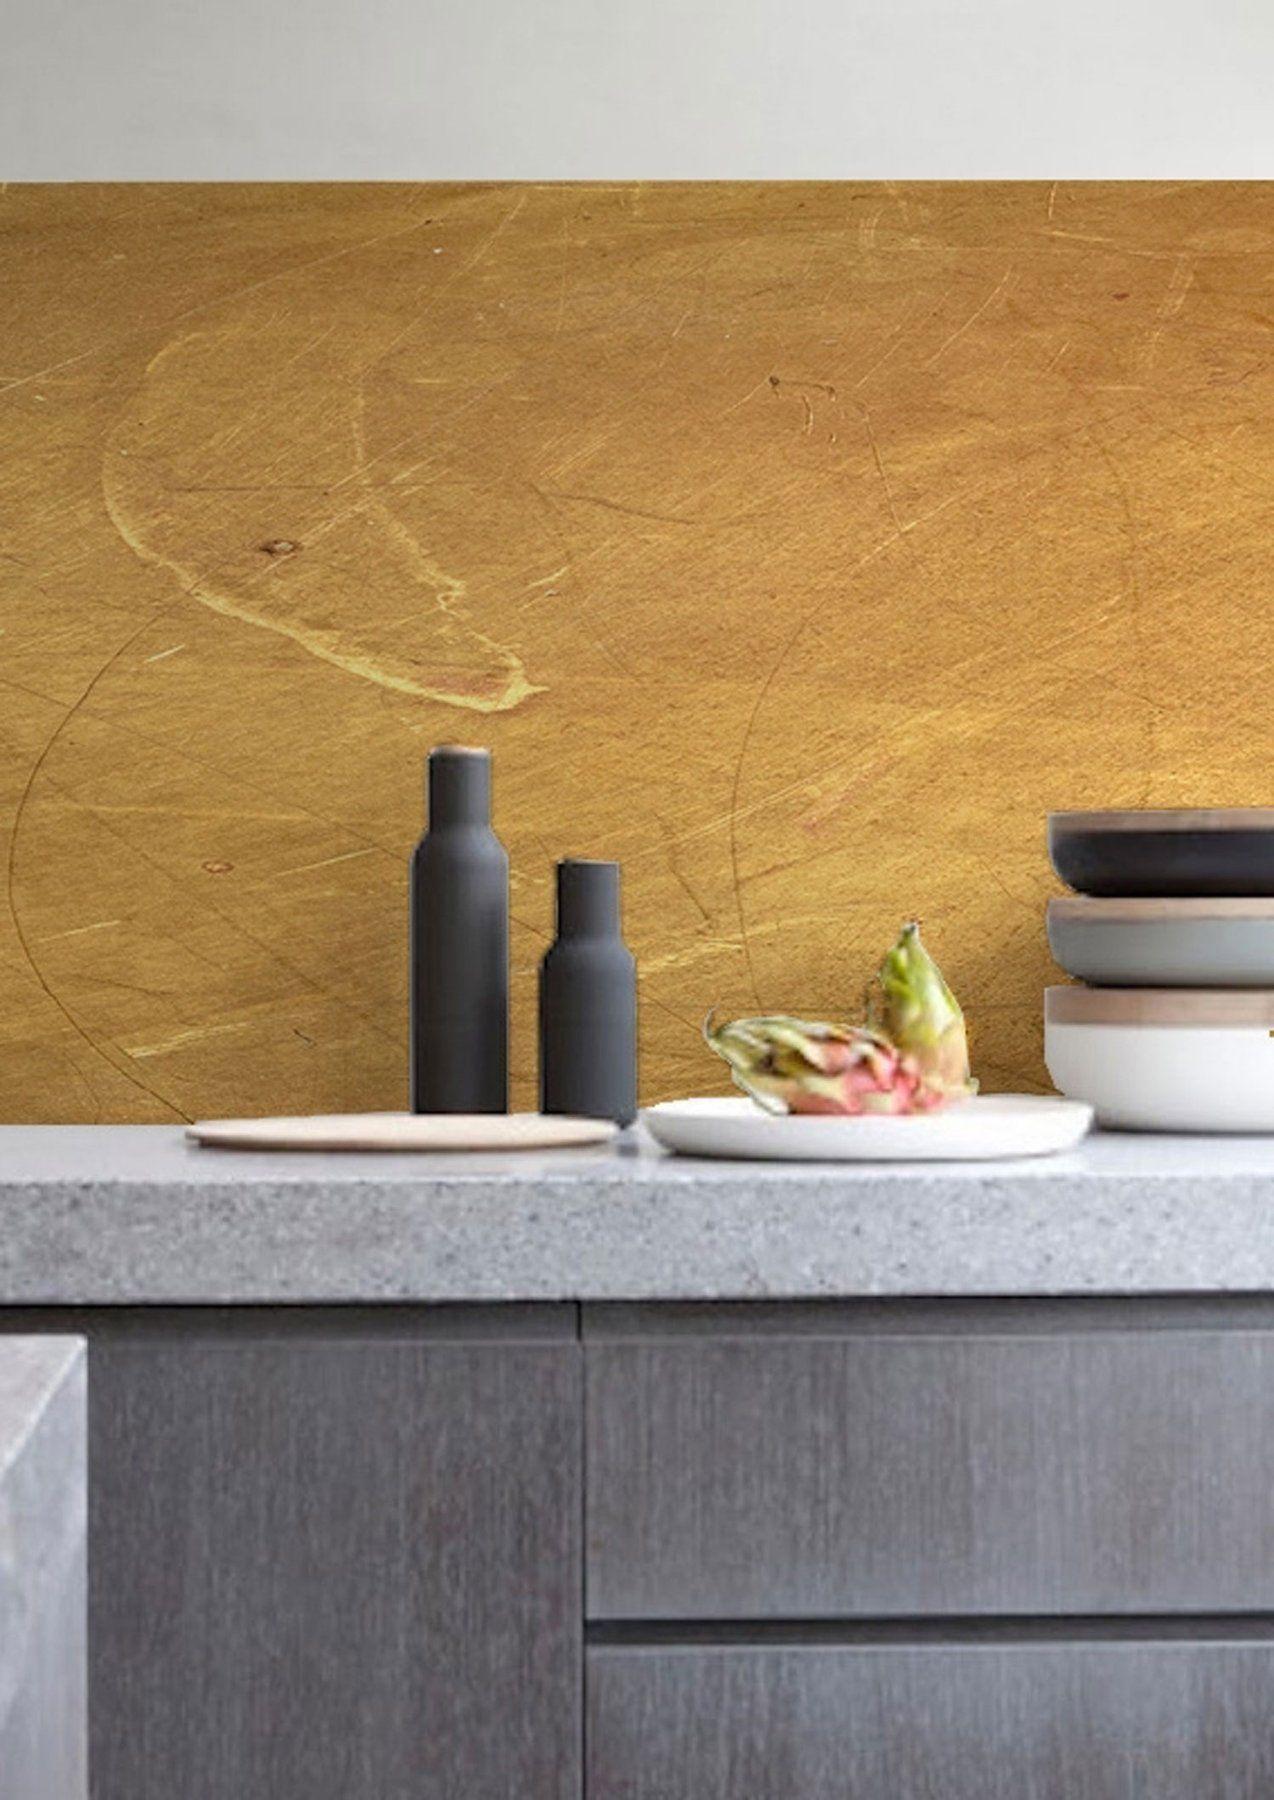 kitchenwalls wallpaper splashback gold  lime lace